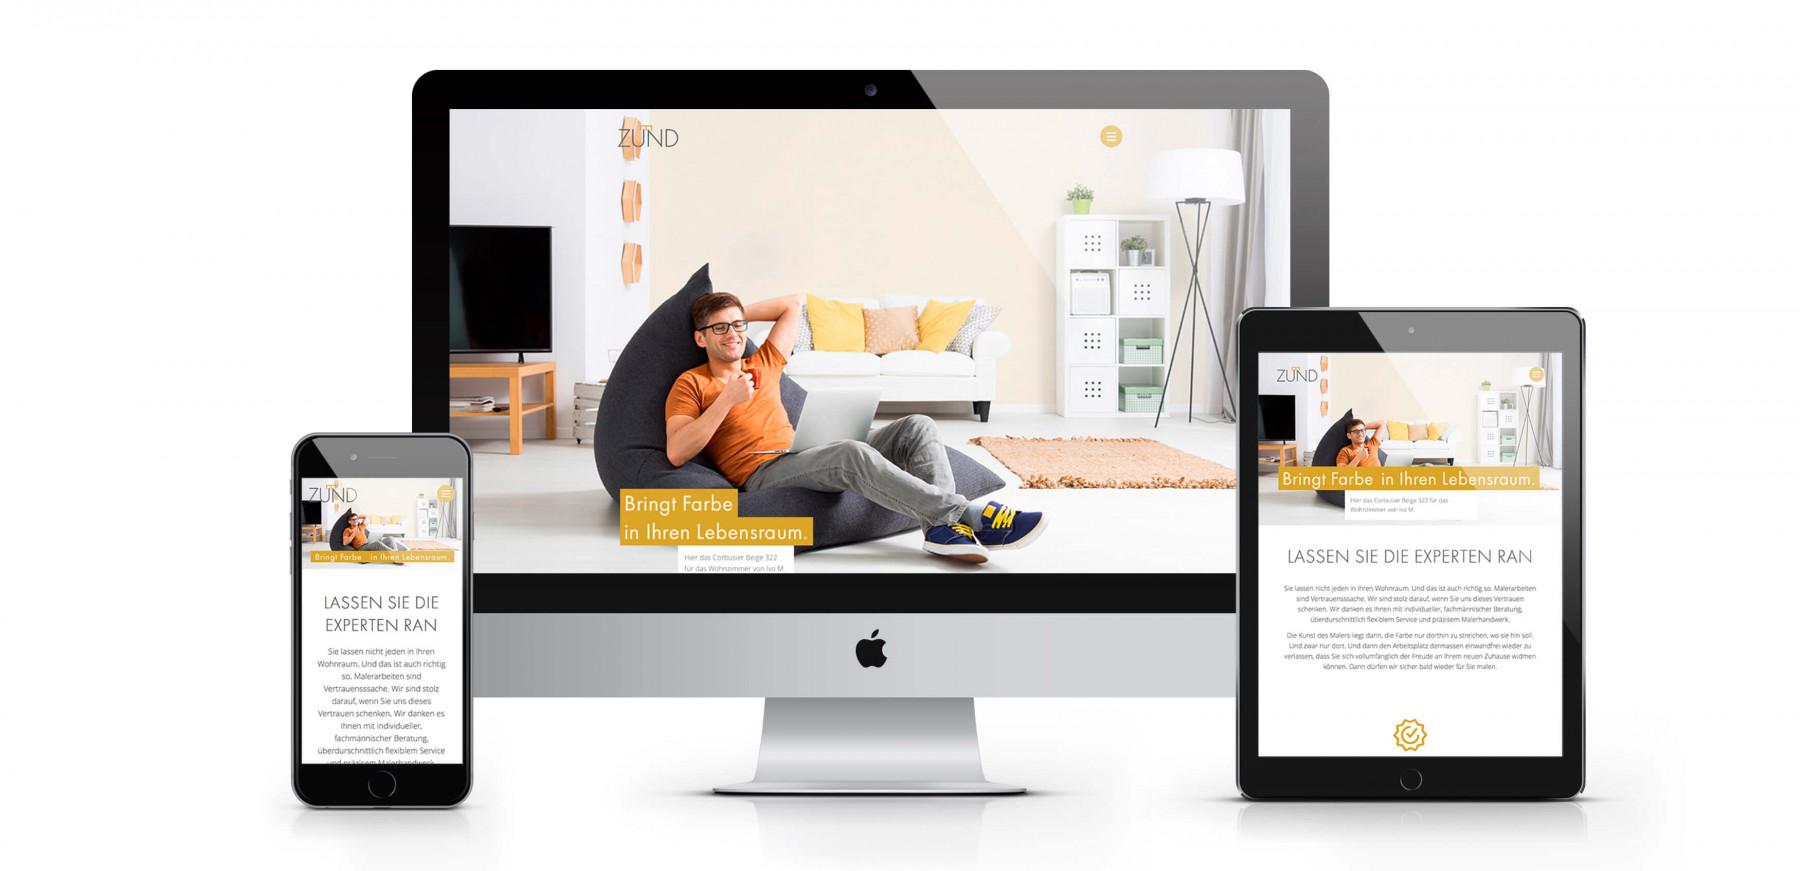 Maler Zünd AG > Redesign und Website | Kommpakt AG Kommunikation